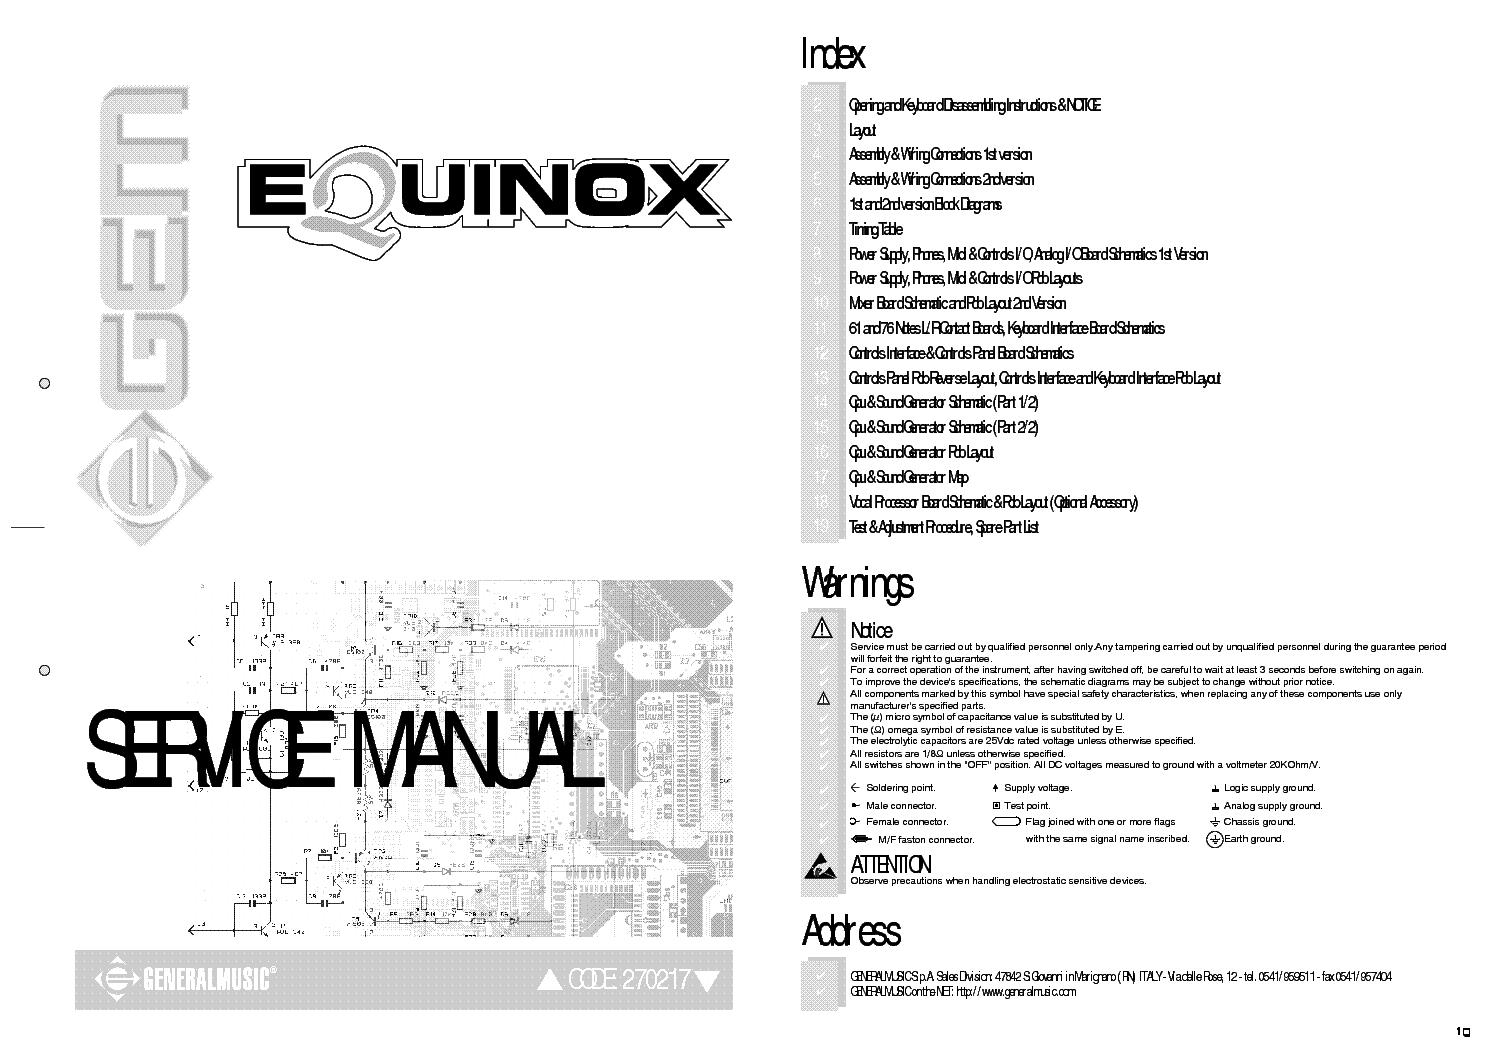 gem equinox sm service manual download schematics eeprom repair rh elektrotanya com gm service manual torrent gm service manual